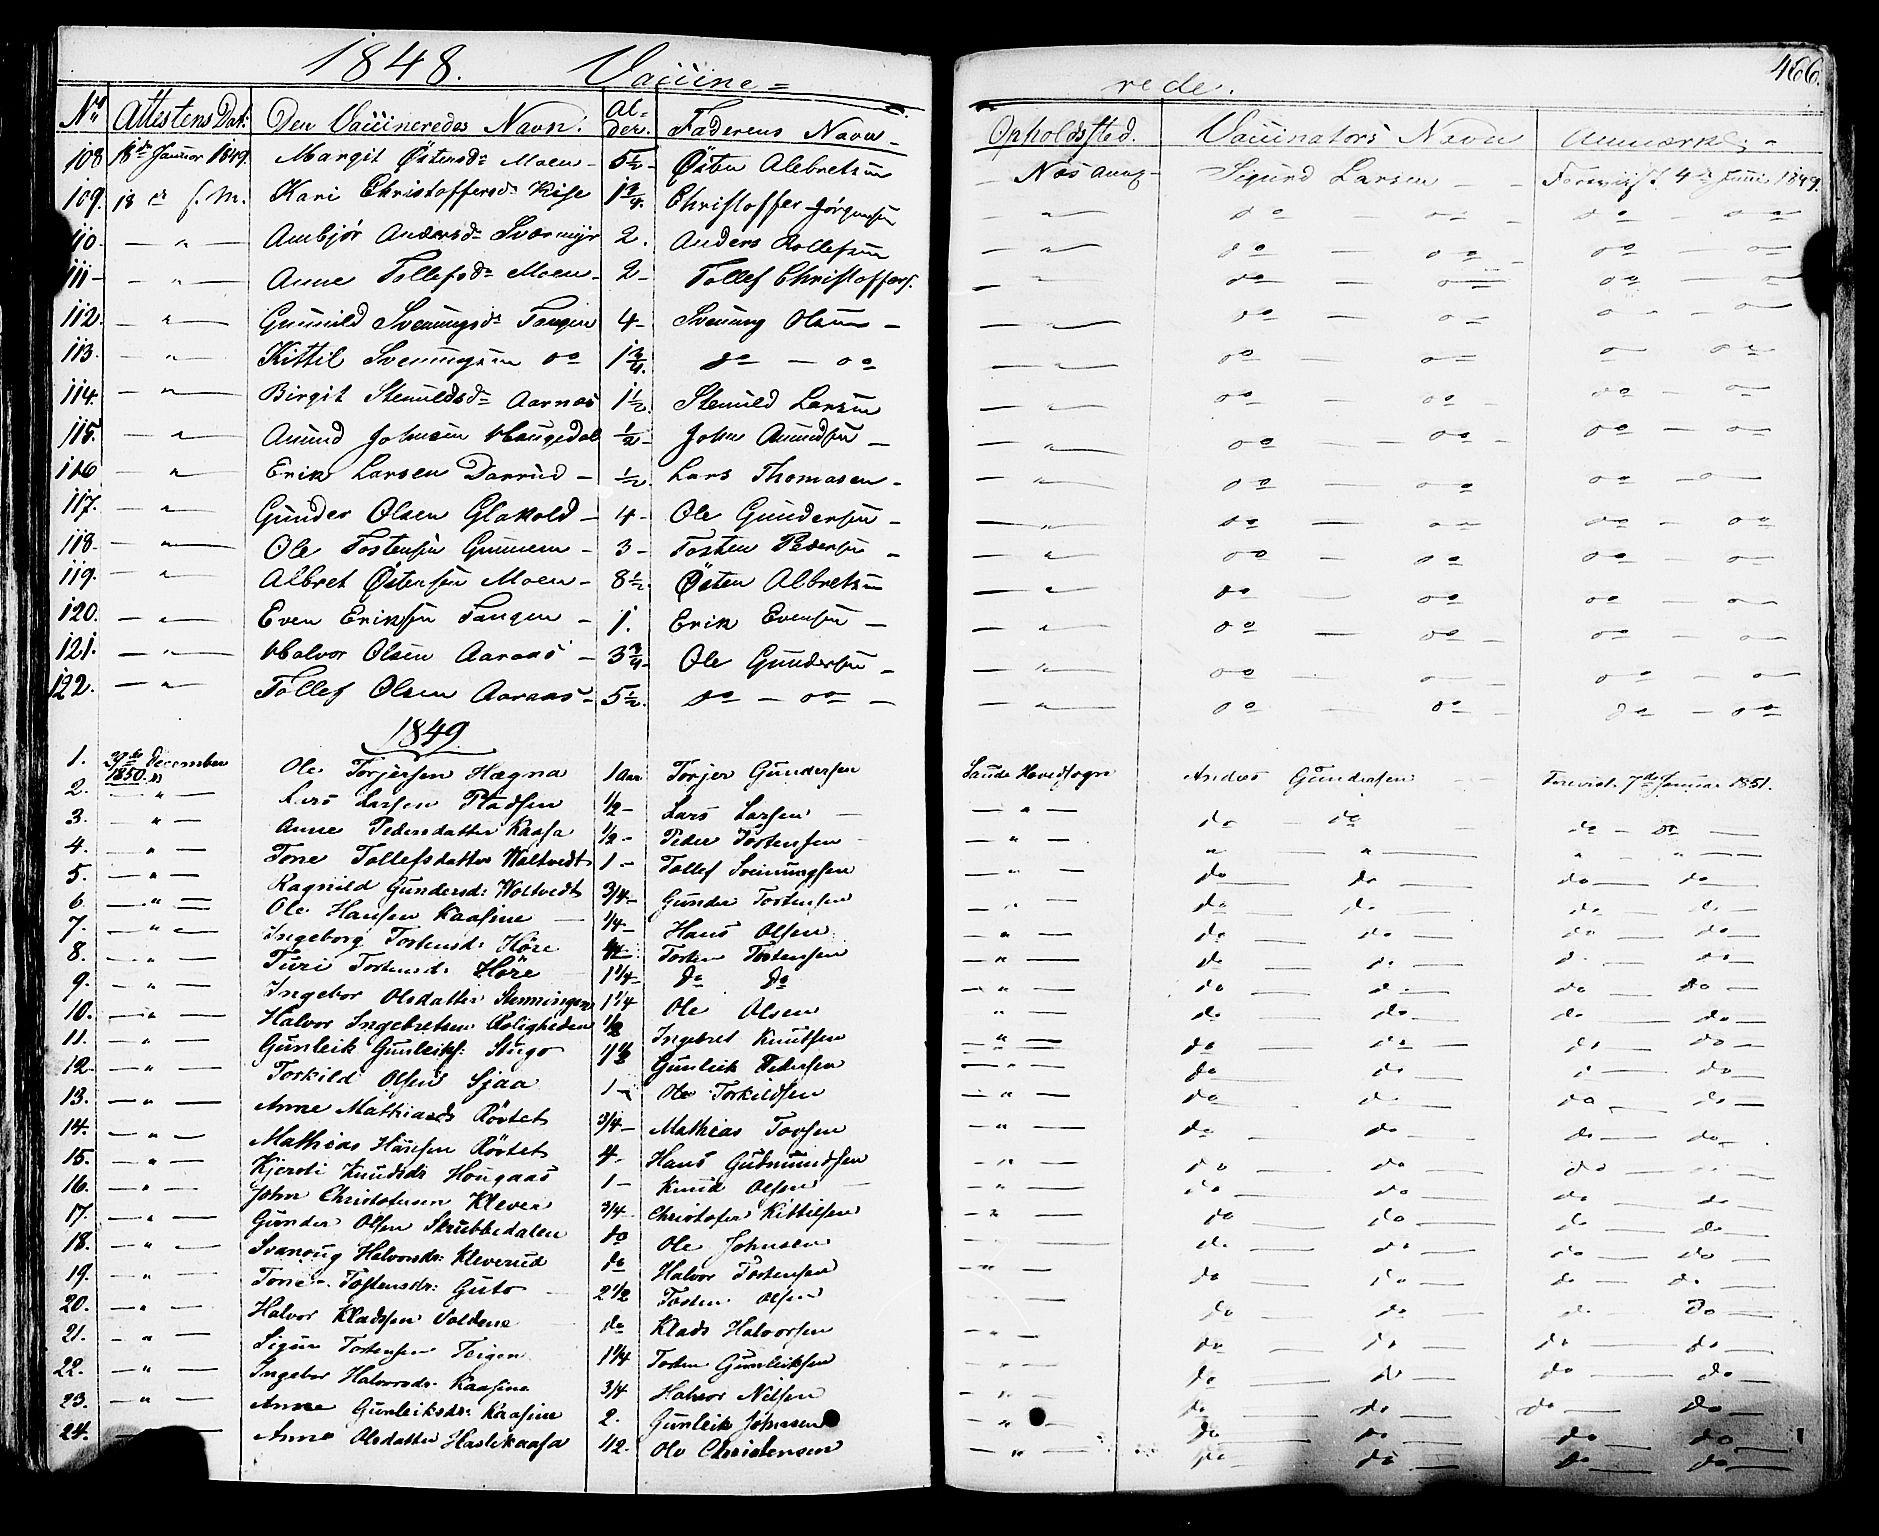 SAKO, Sauherad kirkebøker, F/Fa/L0006: Ministerialbok nr. I 6, 1827-1850, s. 466